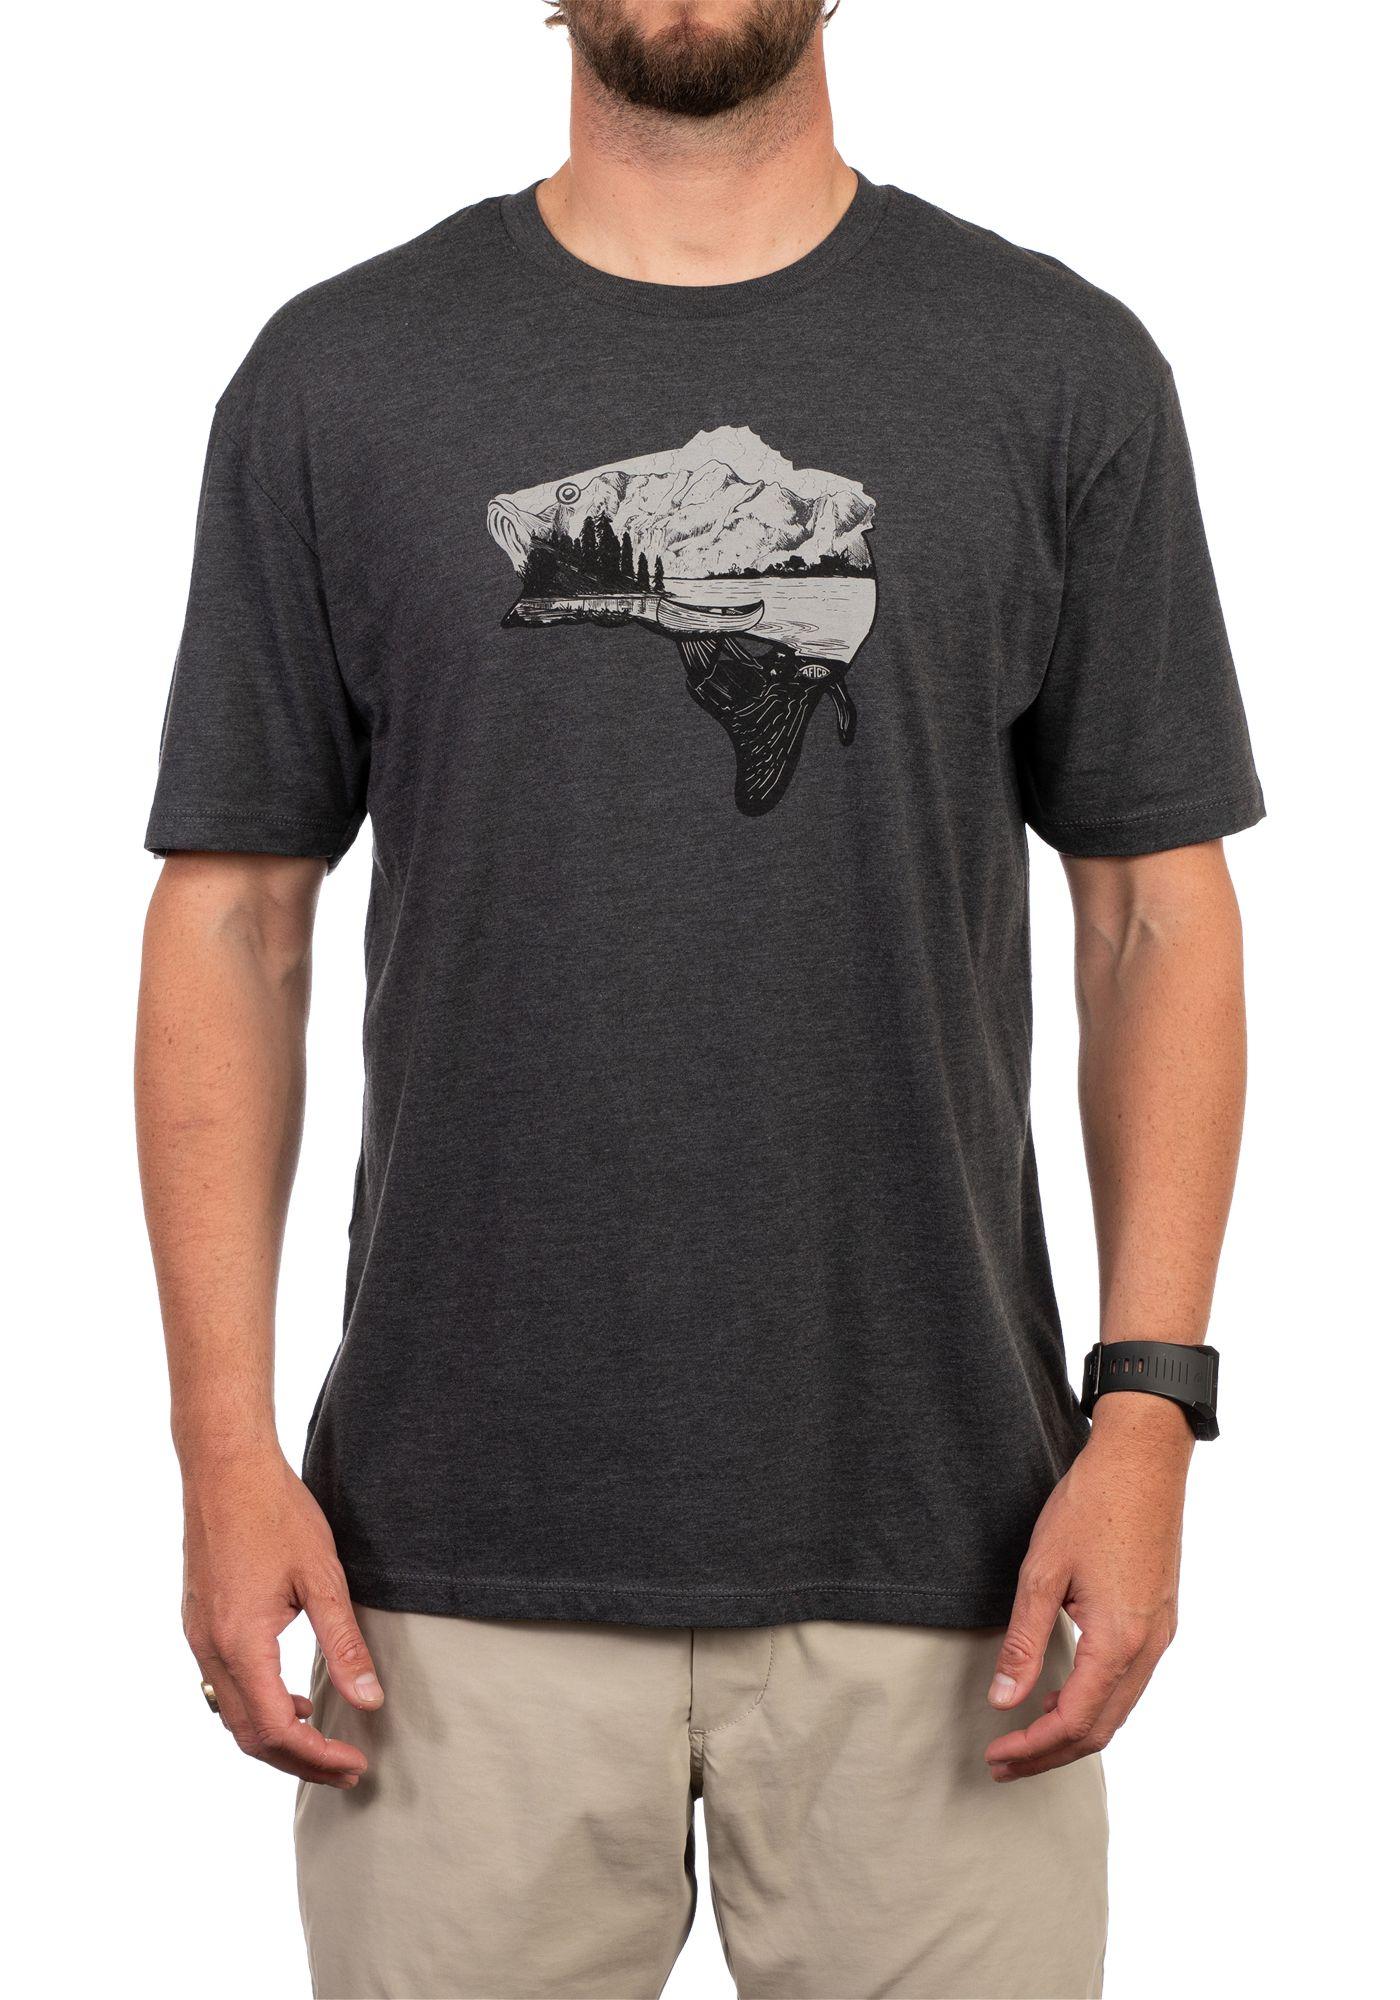 AFTCO Men's Real Wild T-Shirt